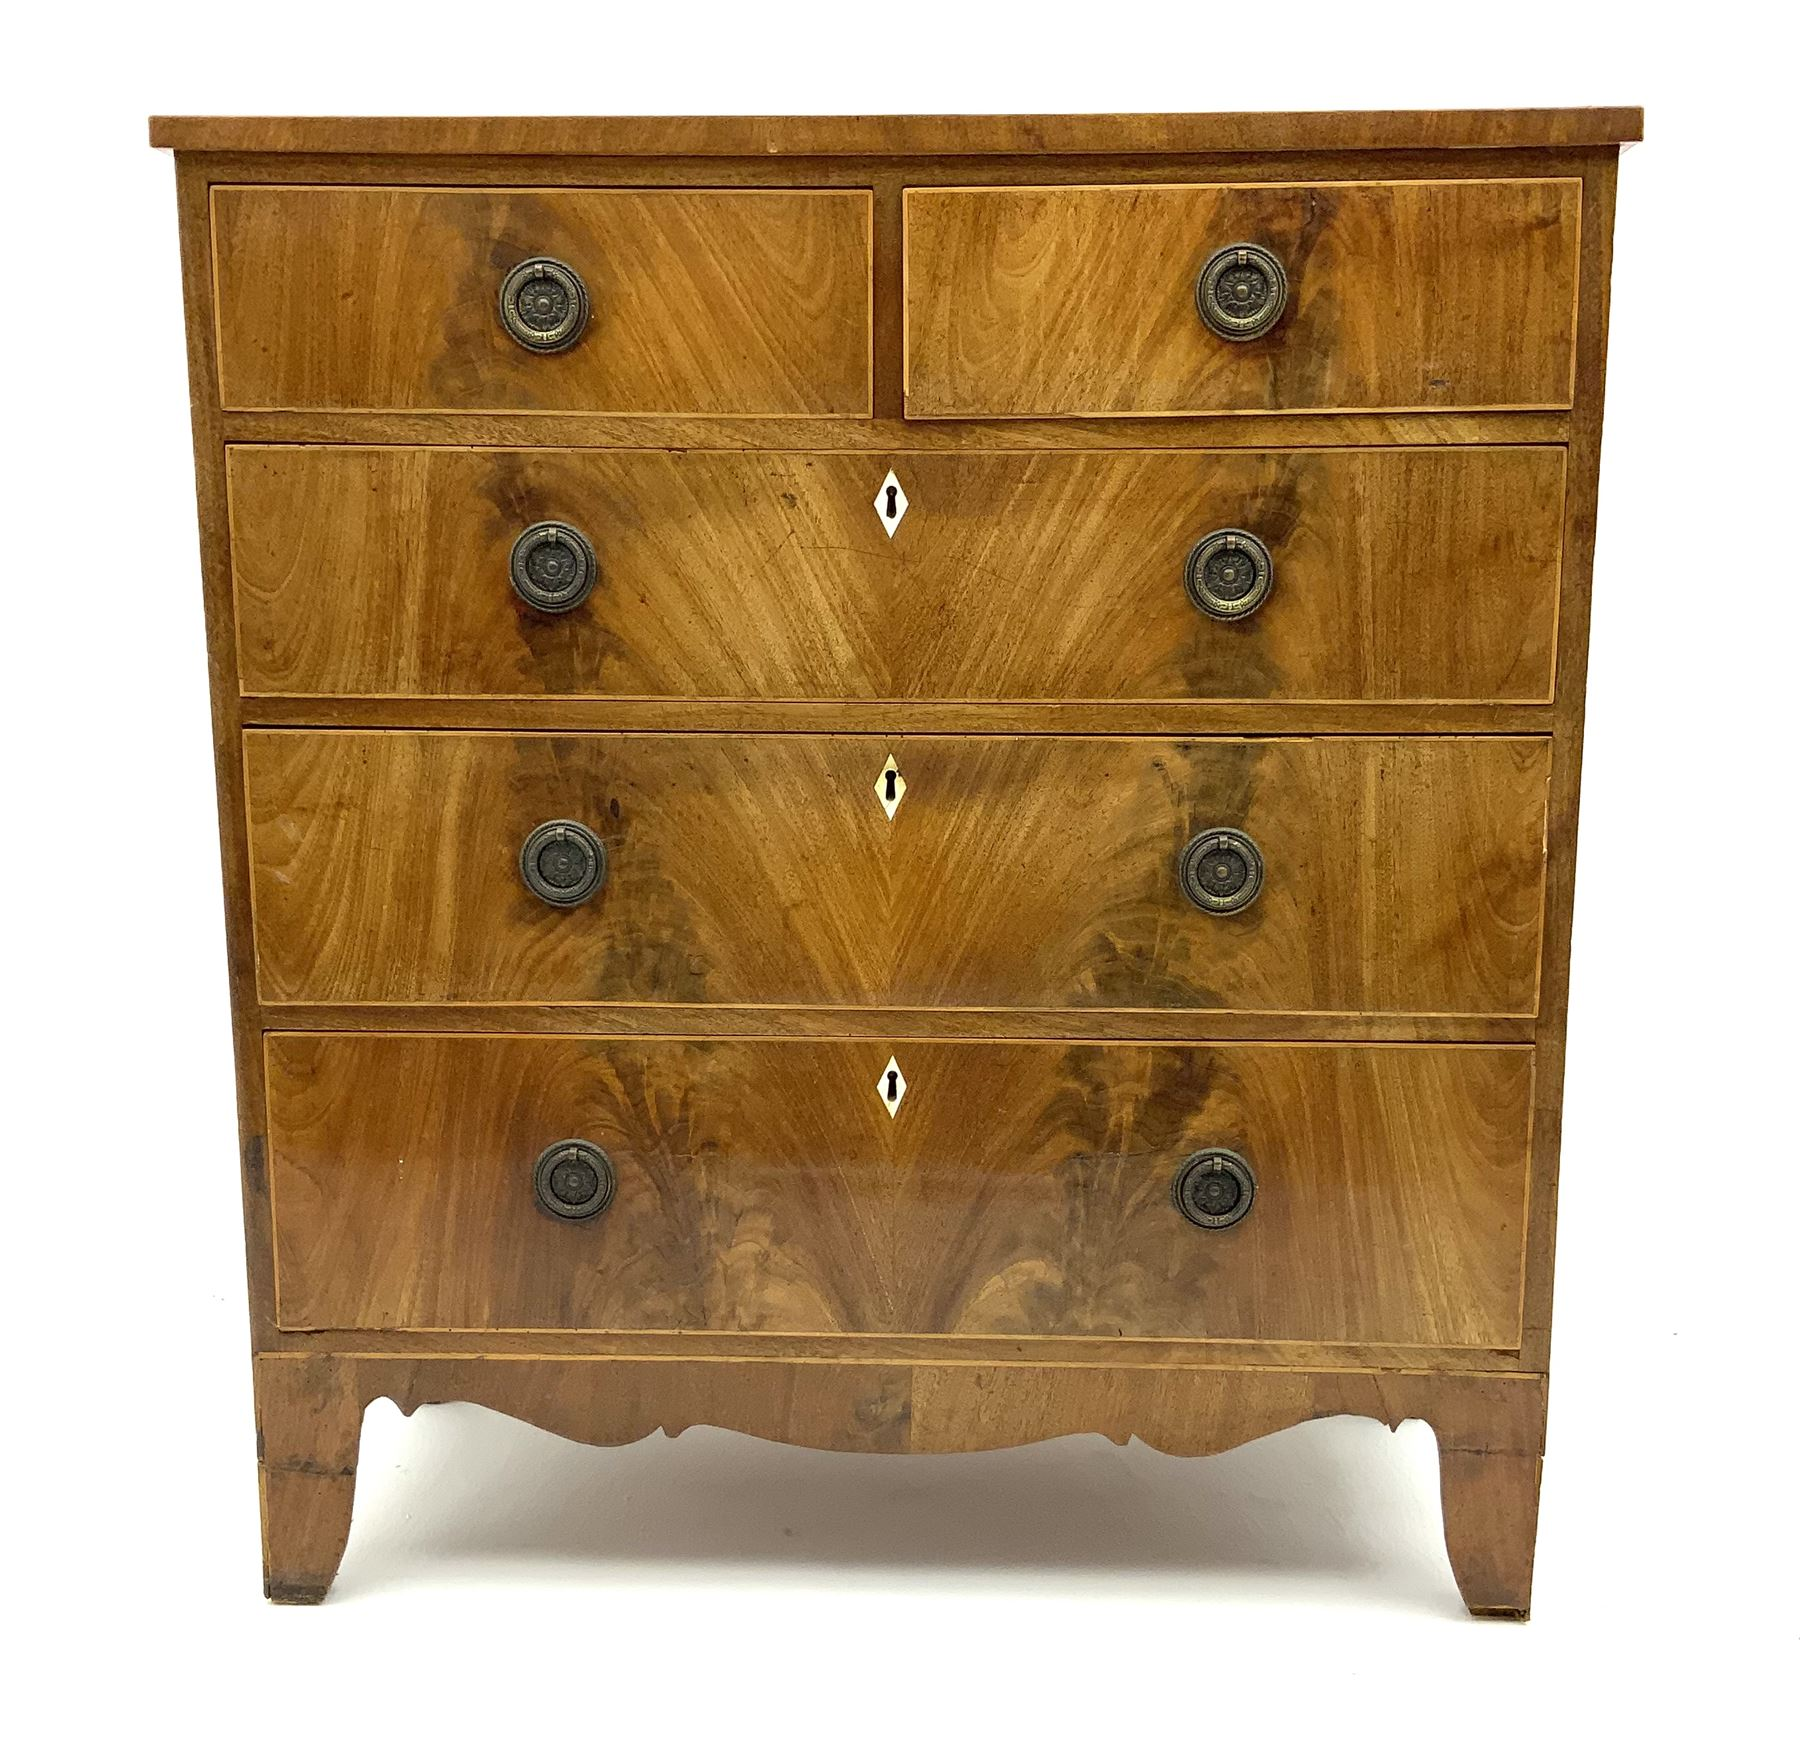 George III inlaid mahogany chest